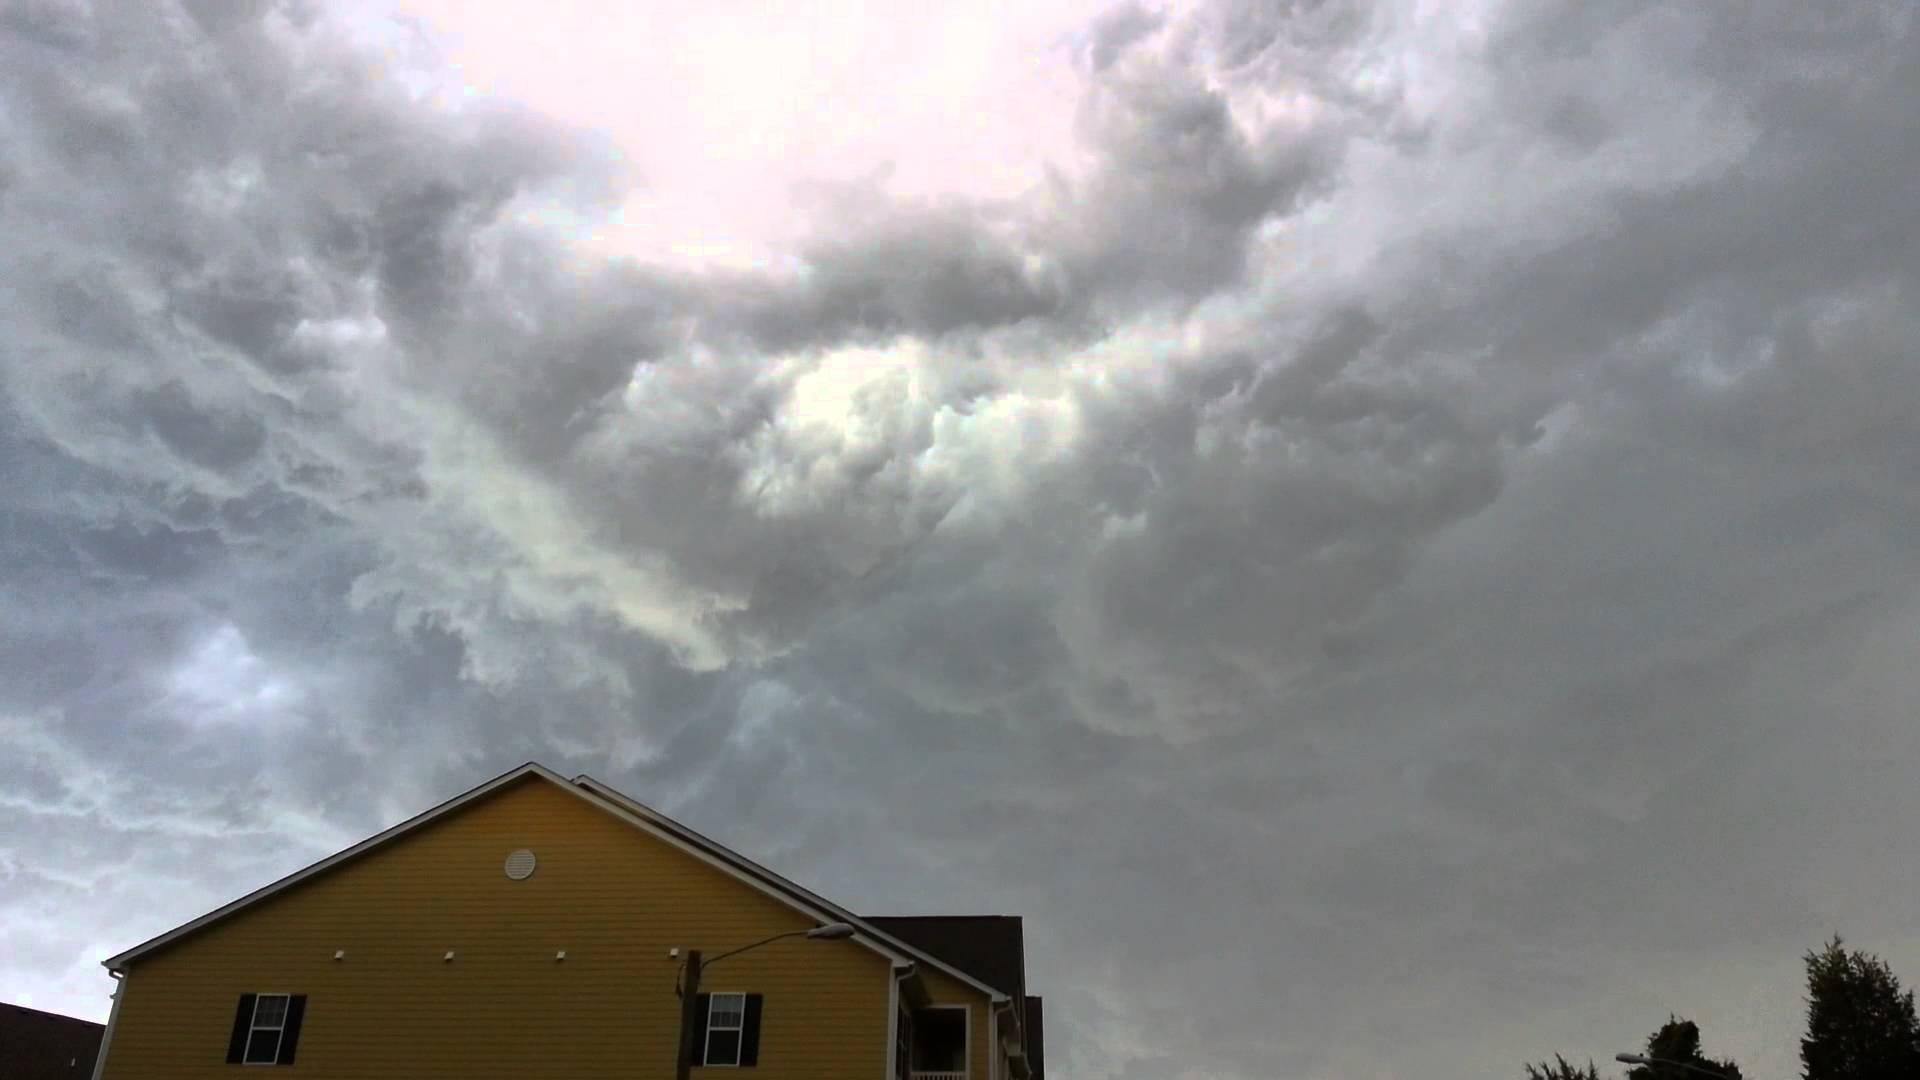 Hurricane forming in Mebane North Carolina - YouTube